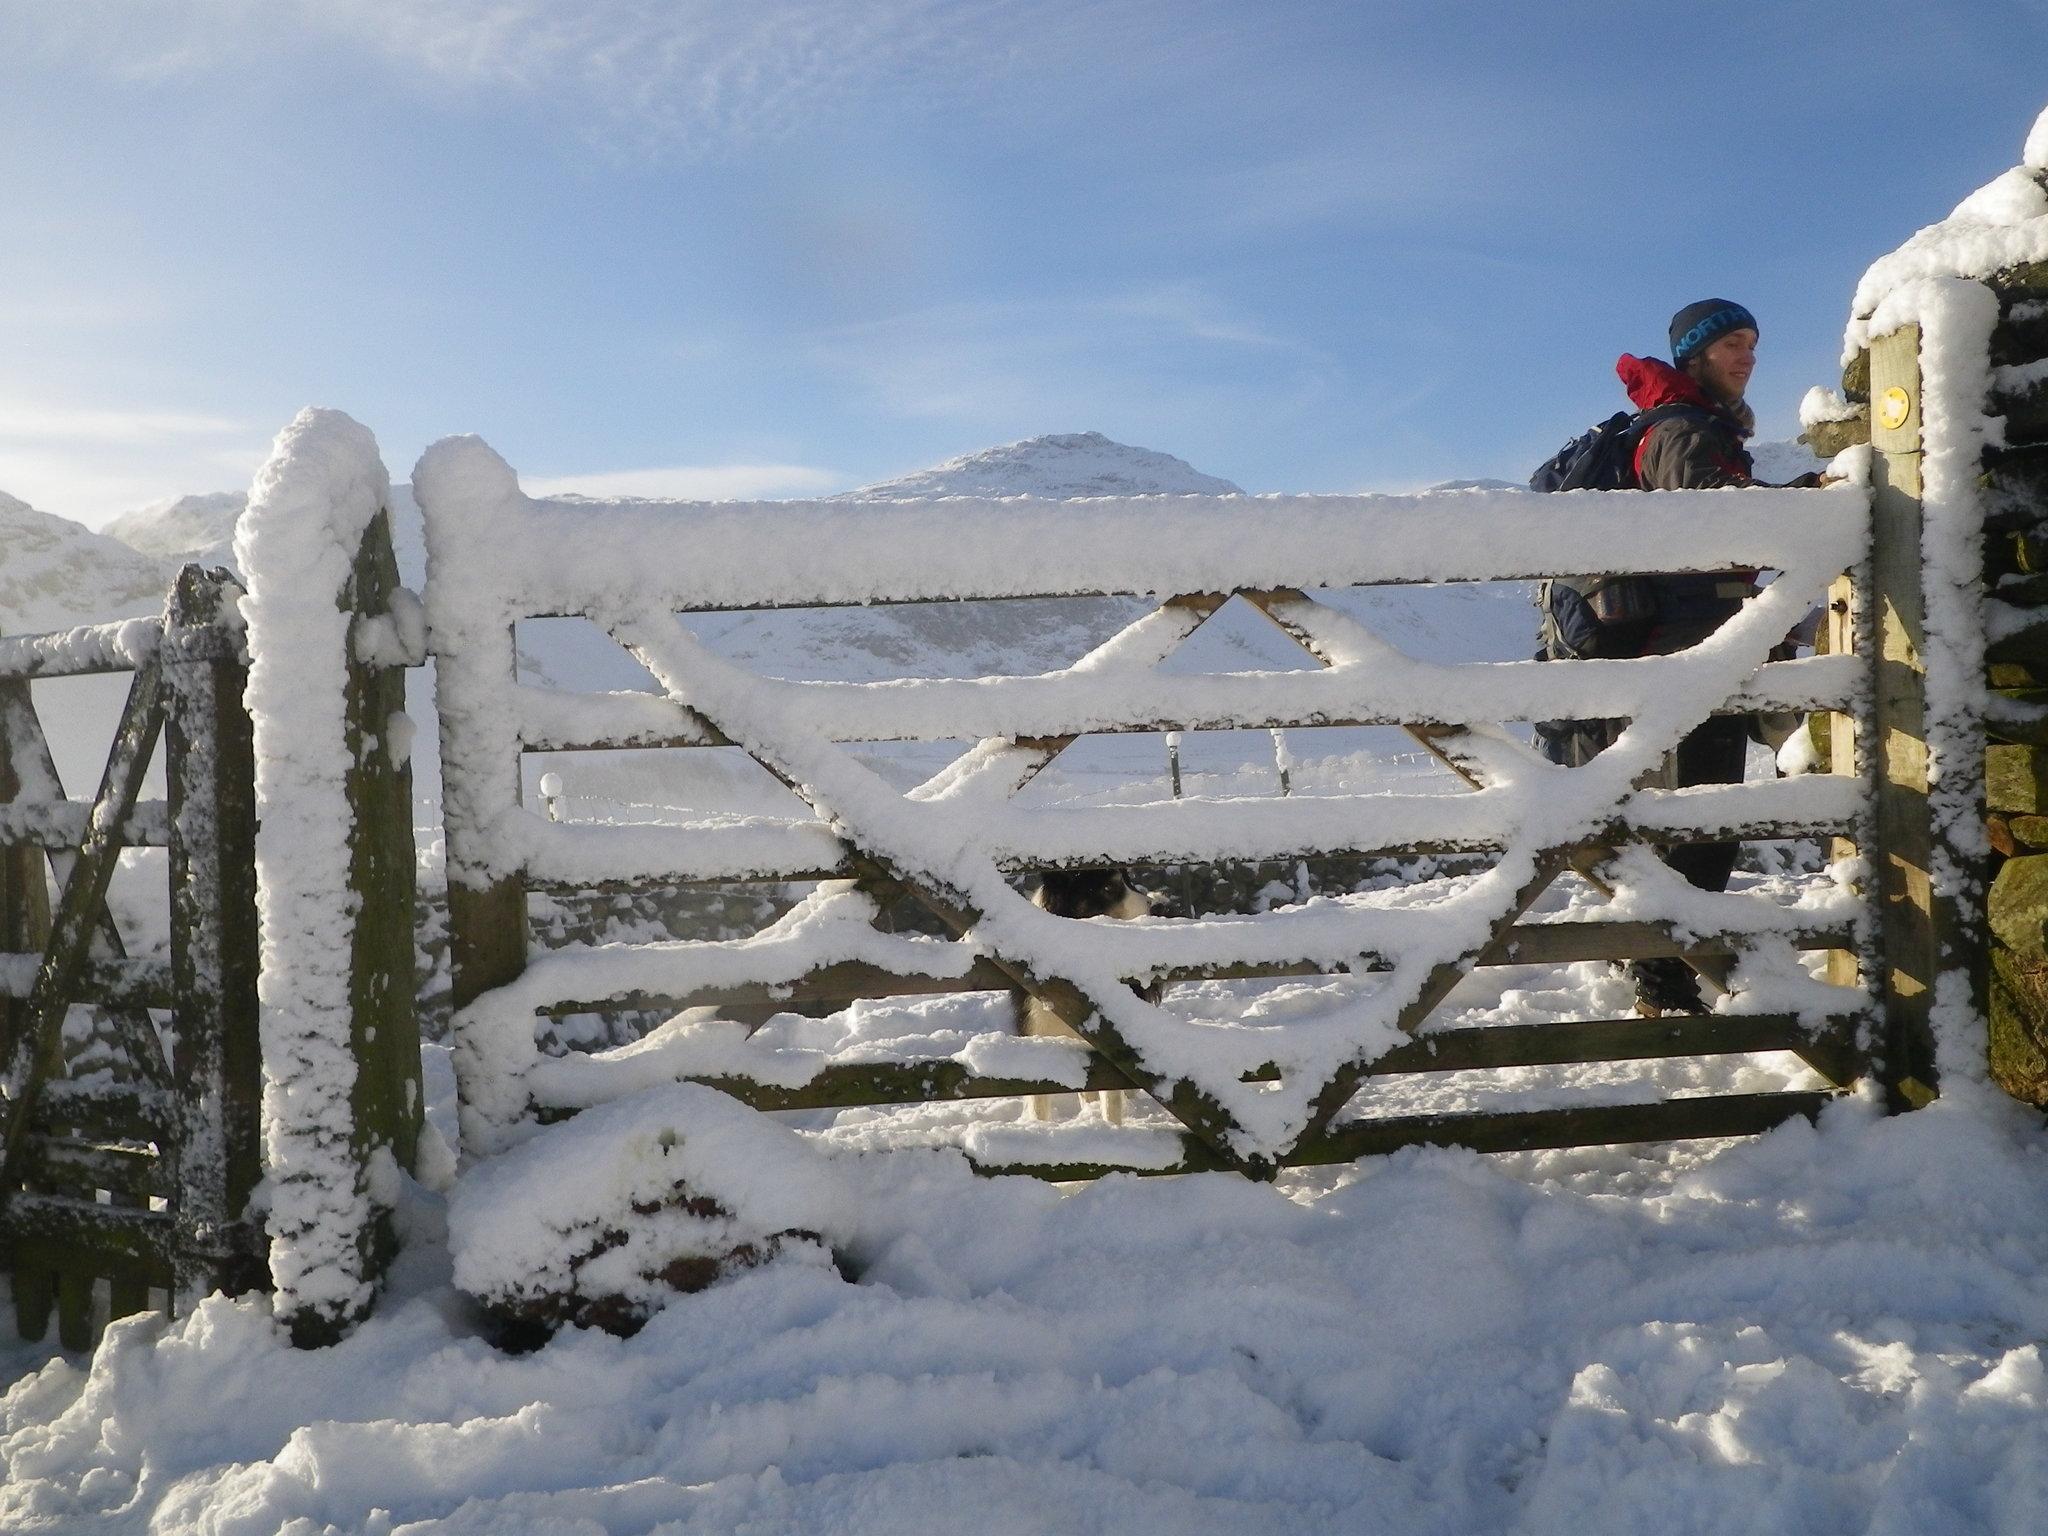 LW 13.01 Lake District winter mountaineering 04 resized.jpg